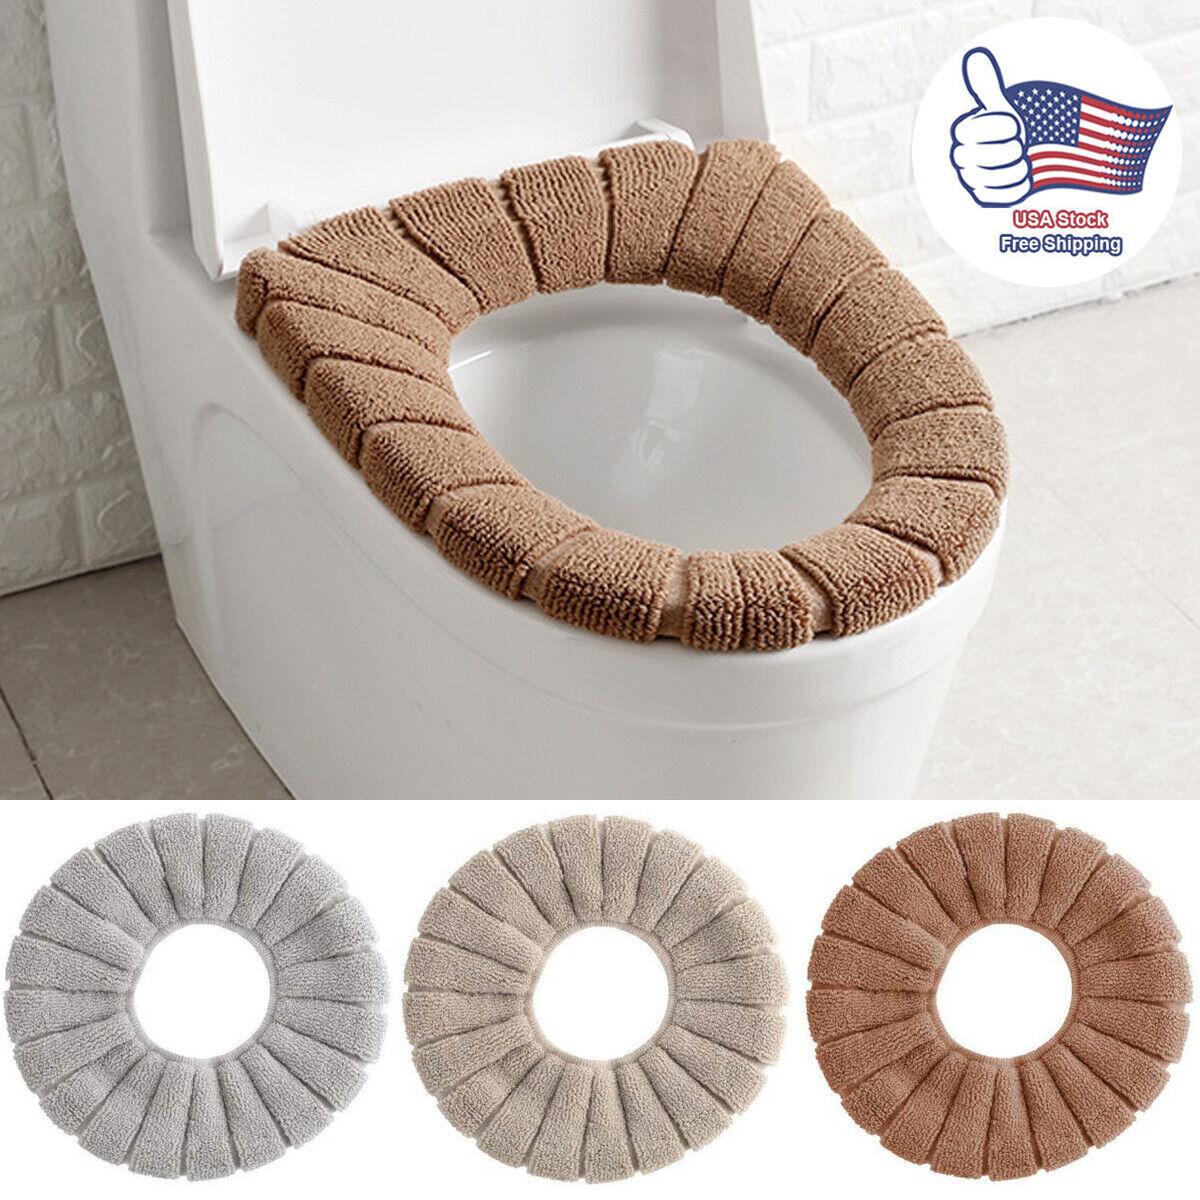 Warm Toilet Seat Cover Soft Plush Bathroom Closestool Pad Winter Velvet Seat